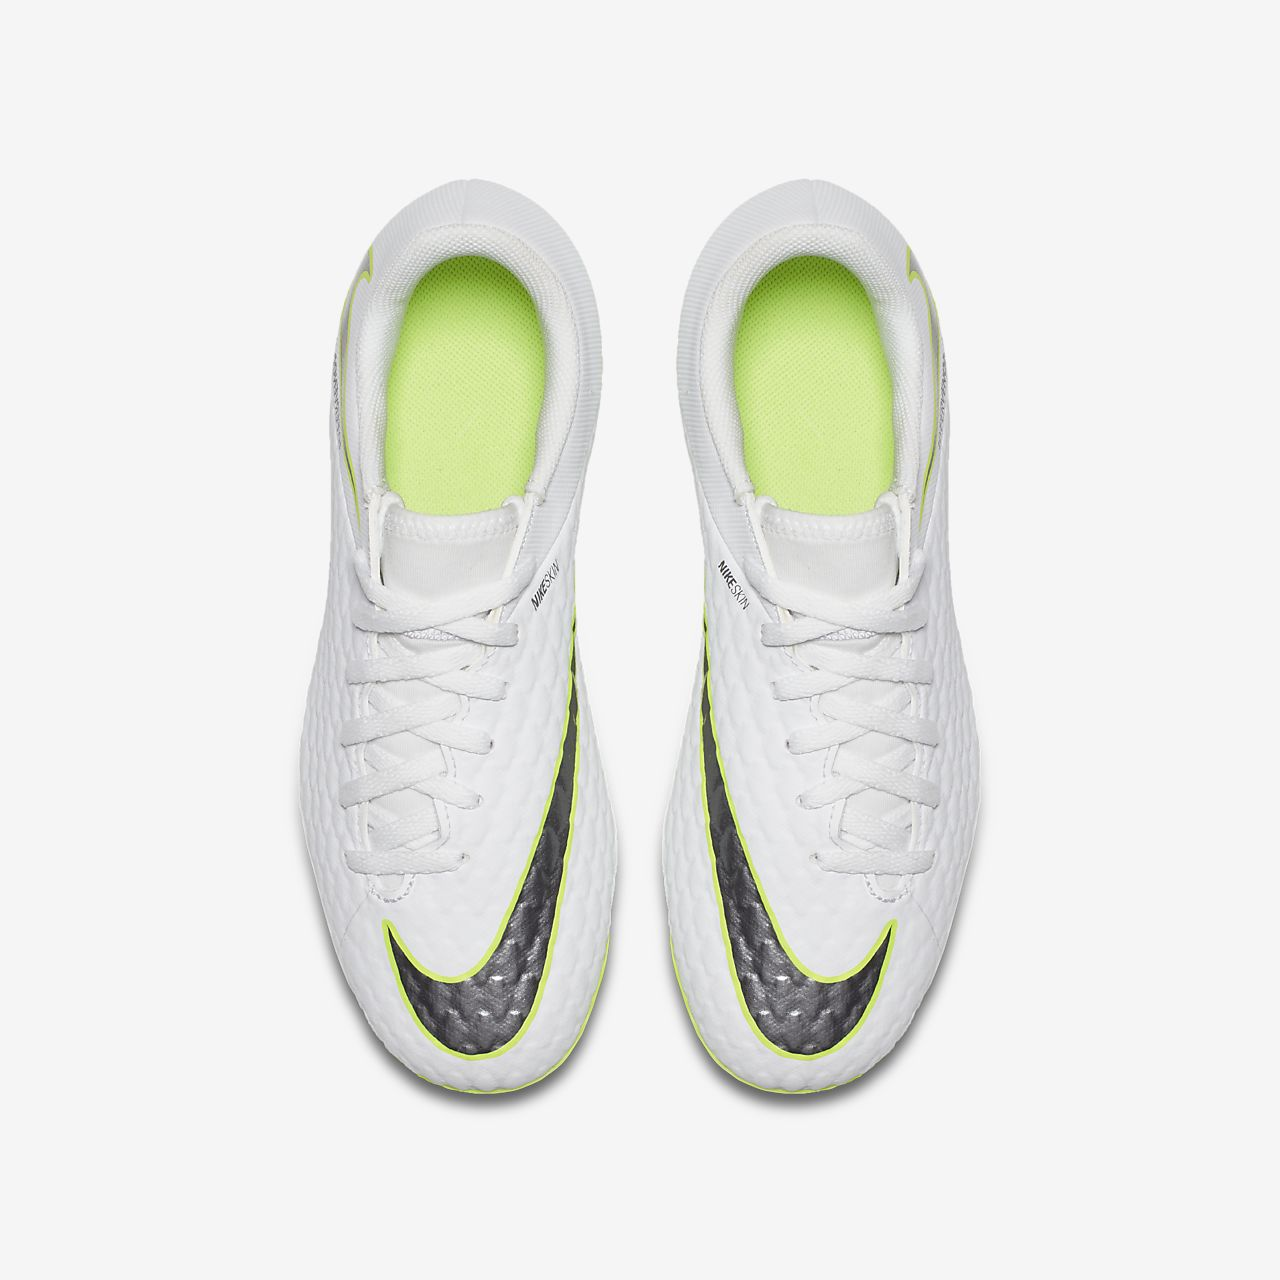 Nike Jr. Hypervenom Phantom III Academy Just Do It YoungerOlder Kids' Firm Ground Football Boot